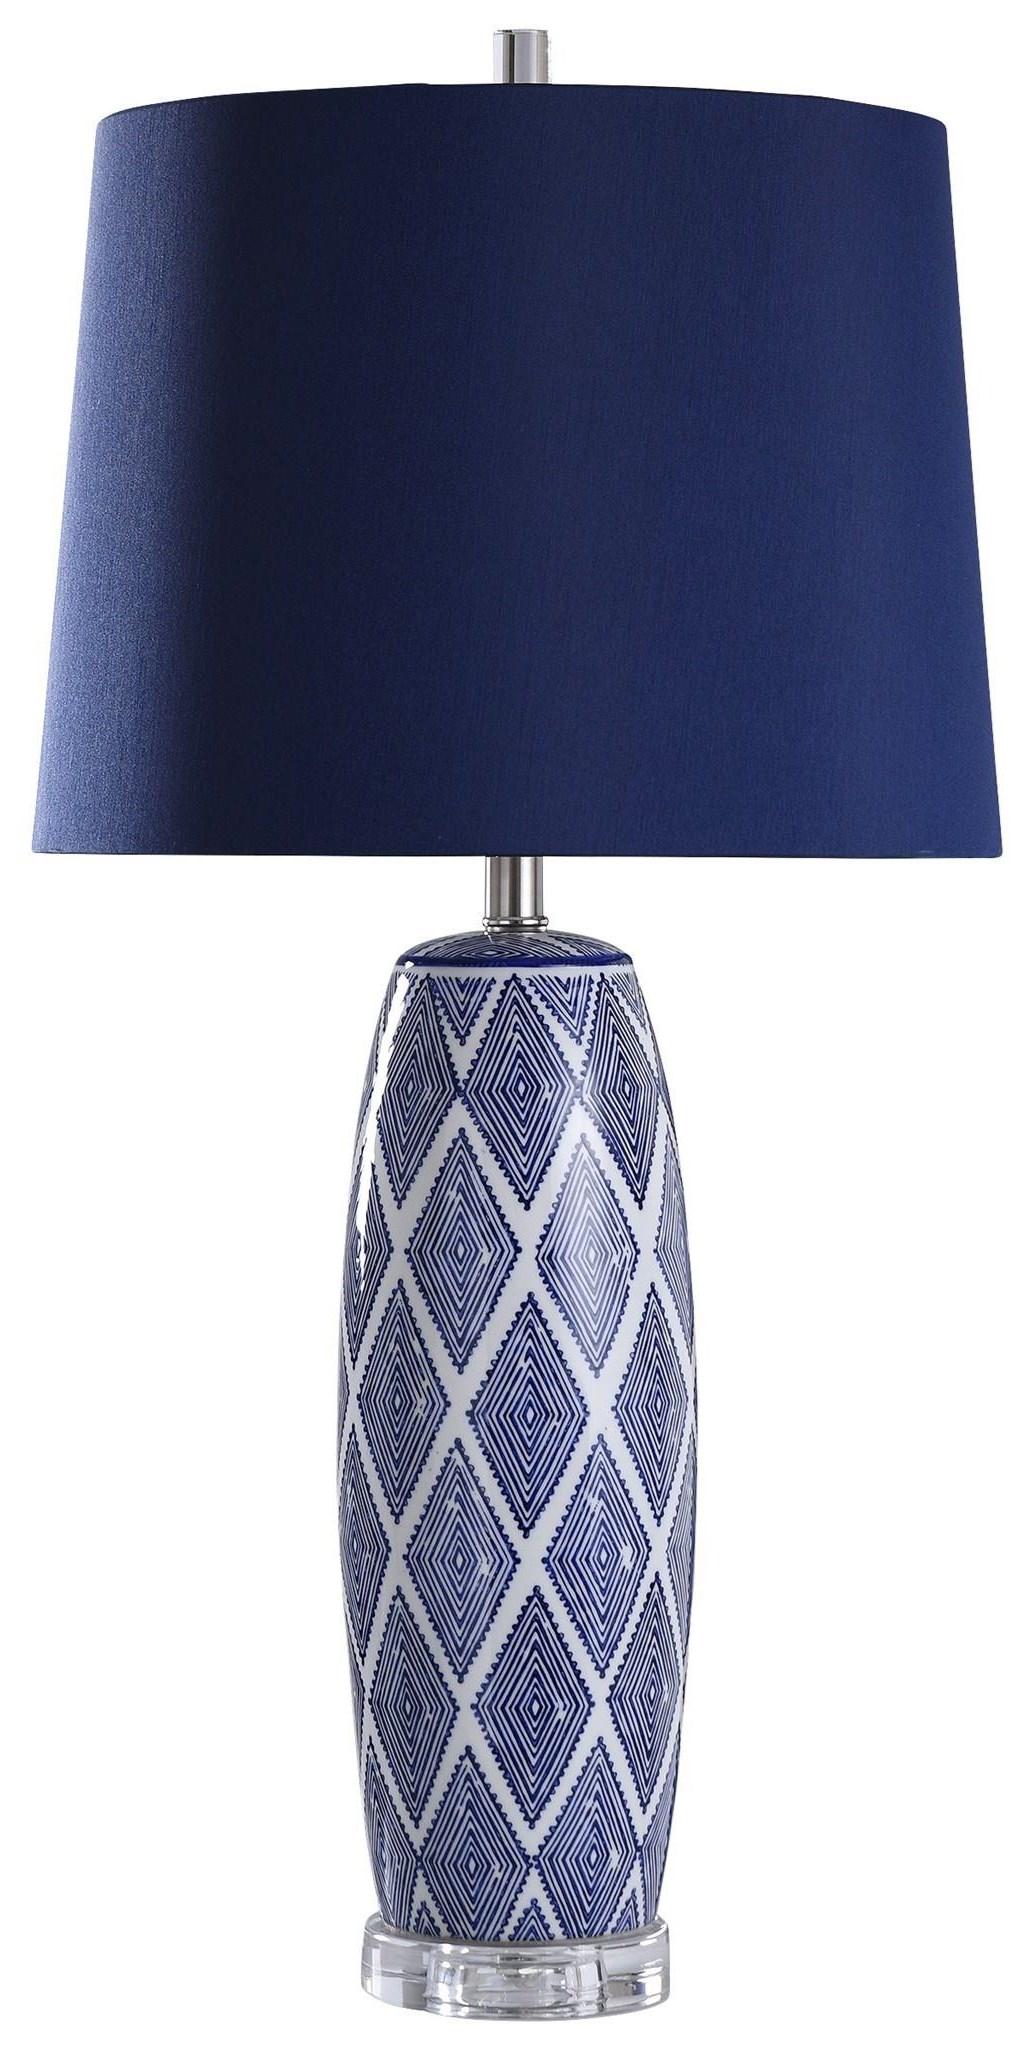 2020 LAMPS NAVY CERAMIC by StyleCraft at Furniture Fair - North Carolina